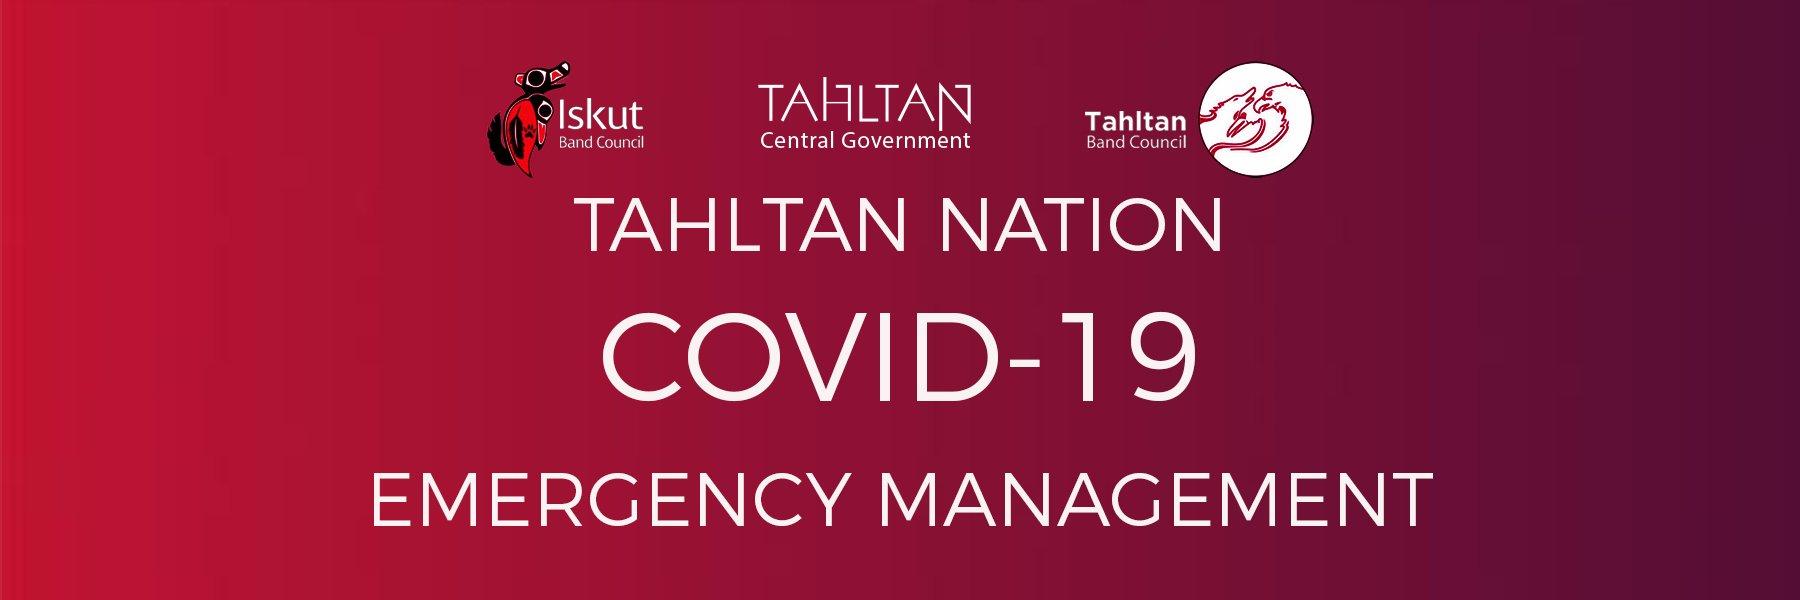 TAHLTAN NATION ANNOUNCE TRAVEL ADVISORY FOR TAHLTAN TERRITORY